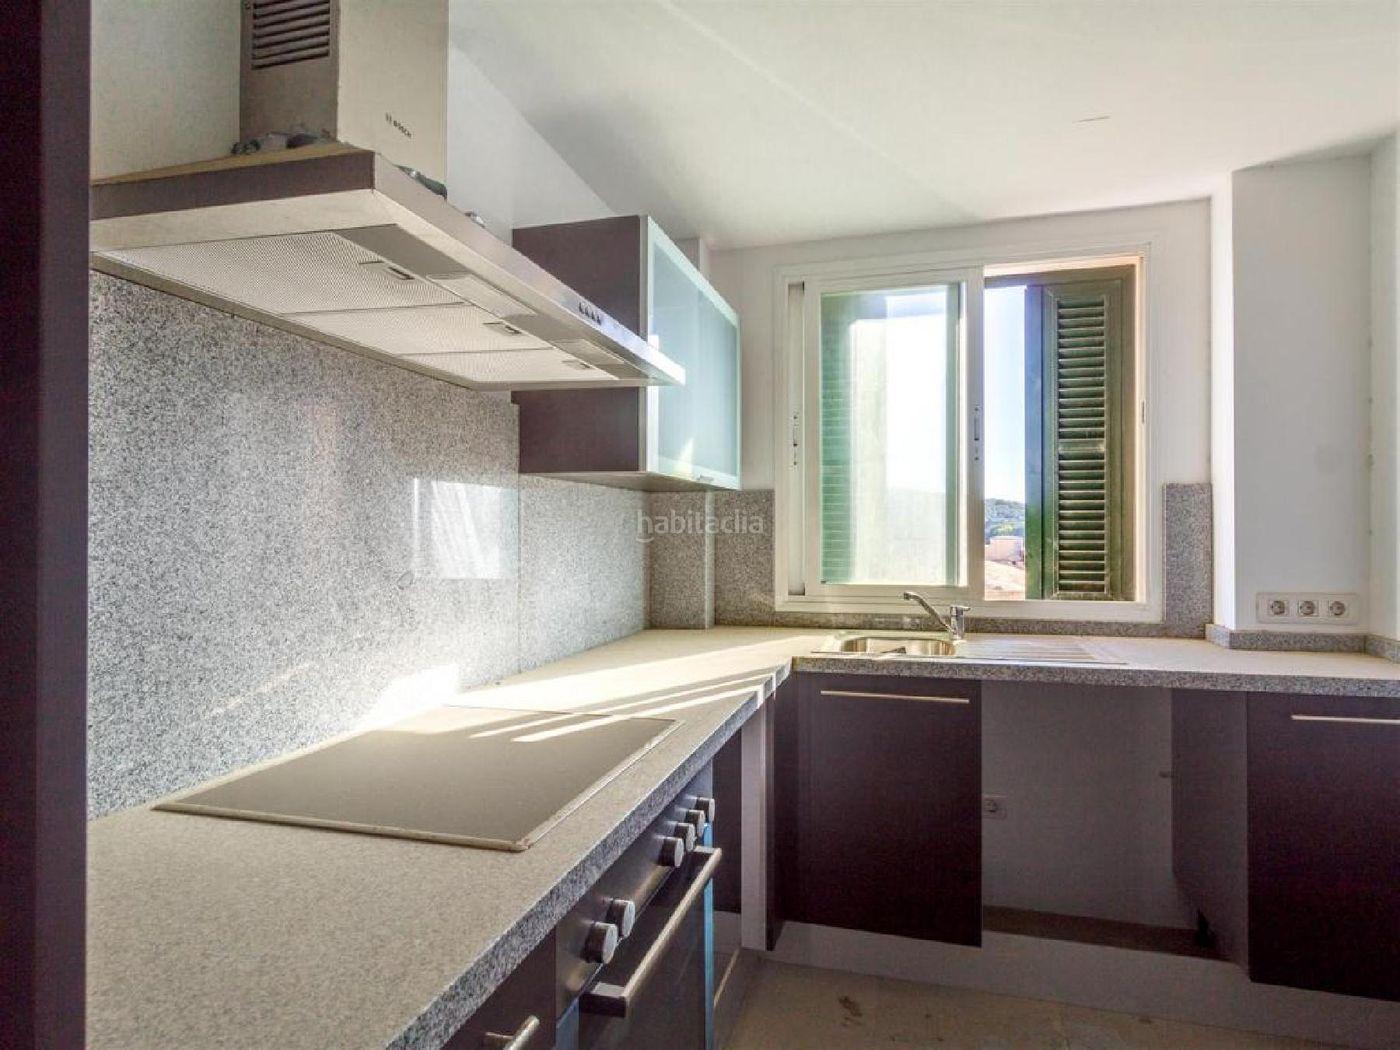 SANTA LLUCIA, 10 Edificio viviendas Obra nueva Felanitx